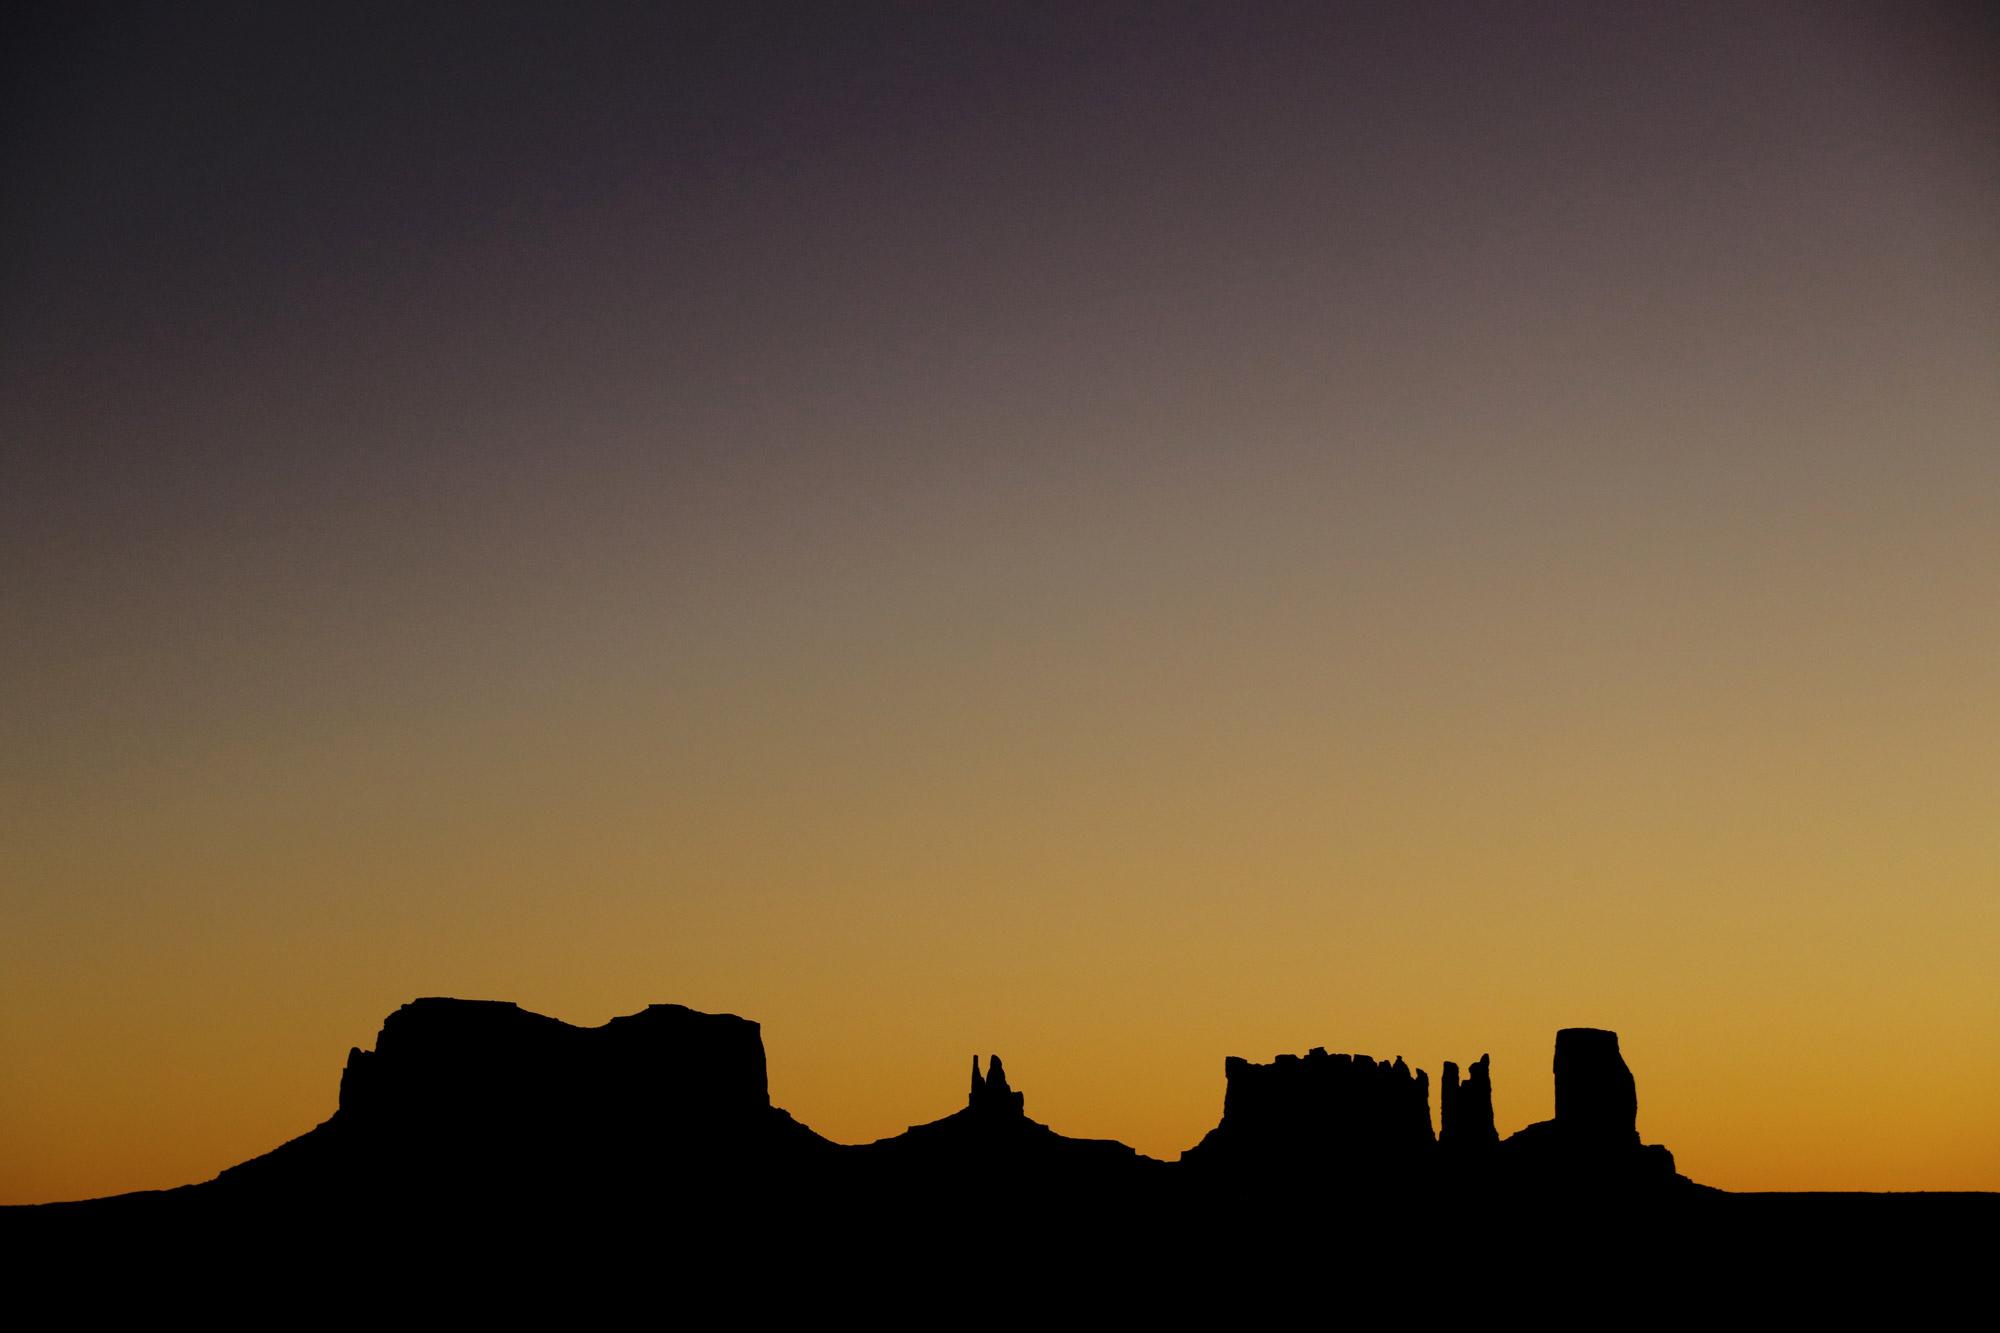 Amerika dag 11 - Monument Valley